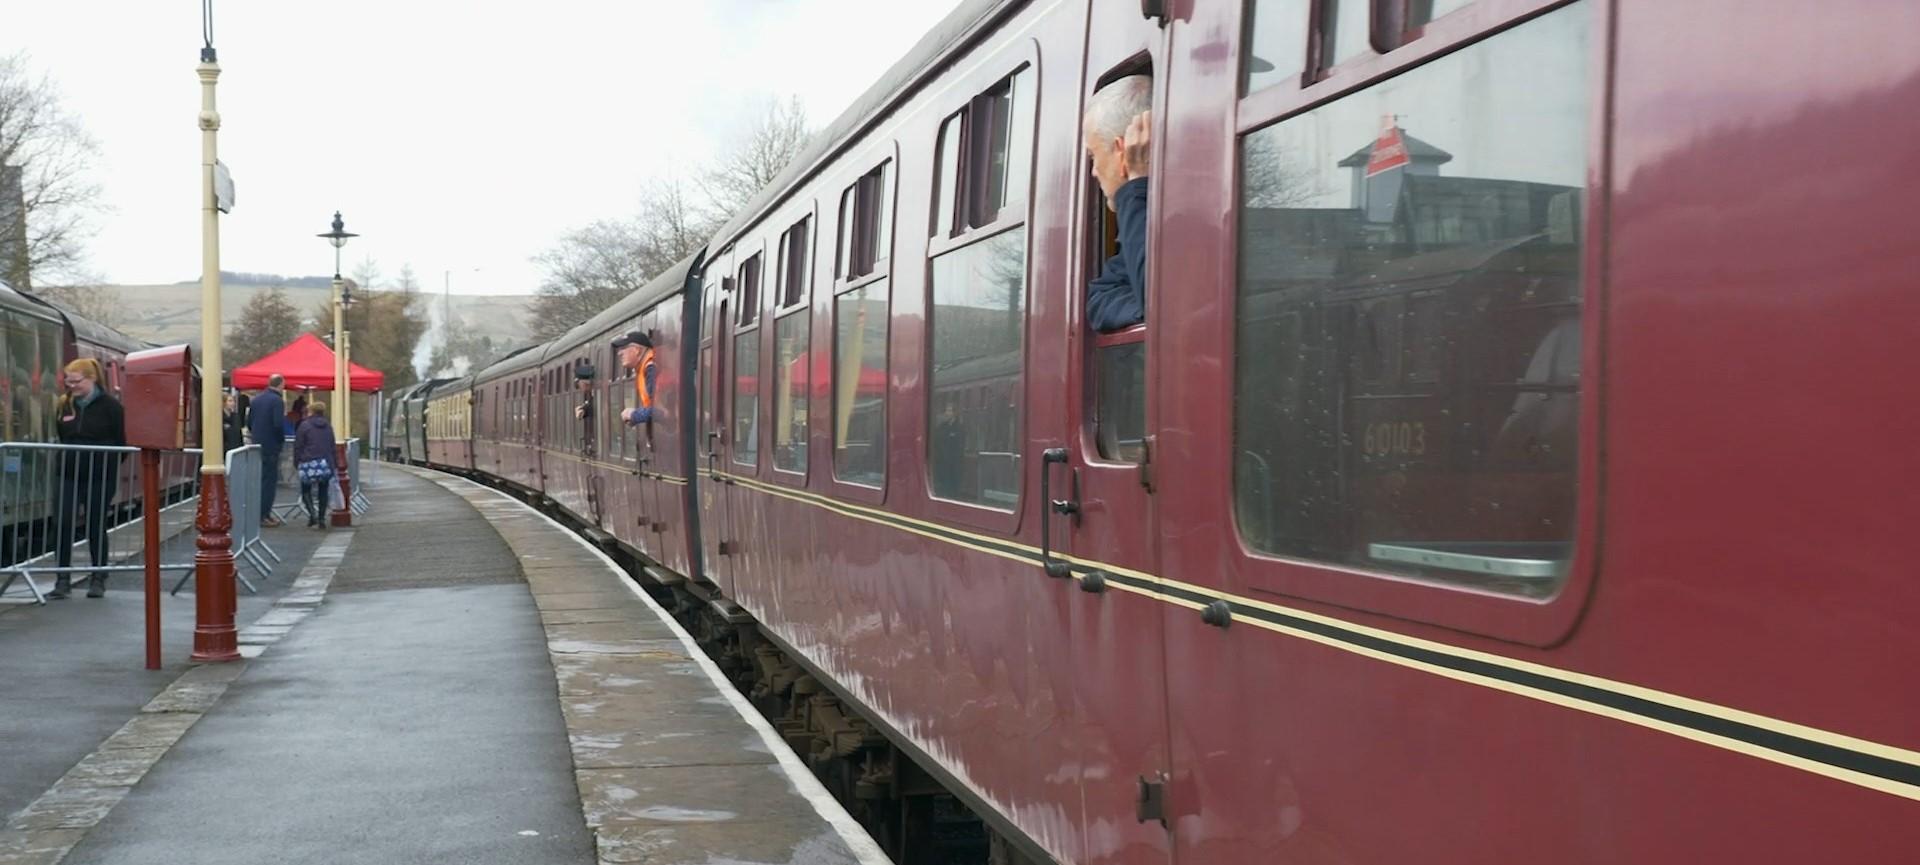 Up close of train on East Lancashire Railway